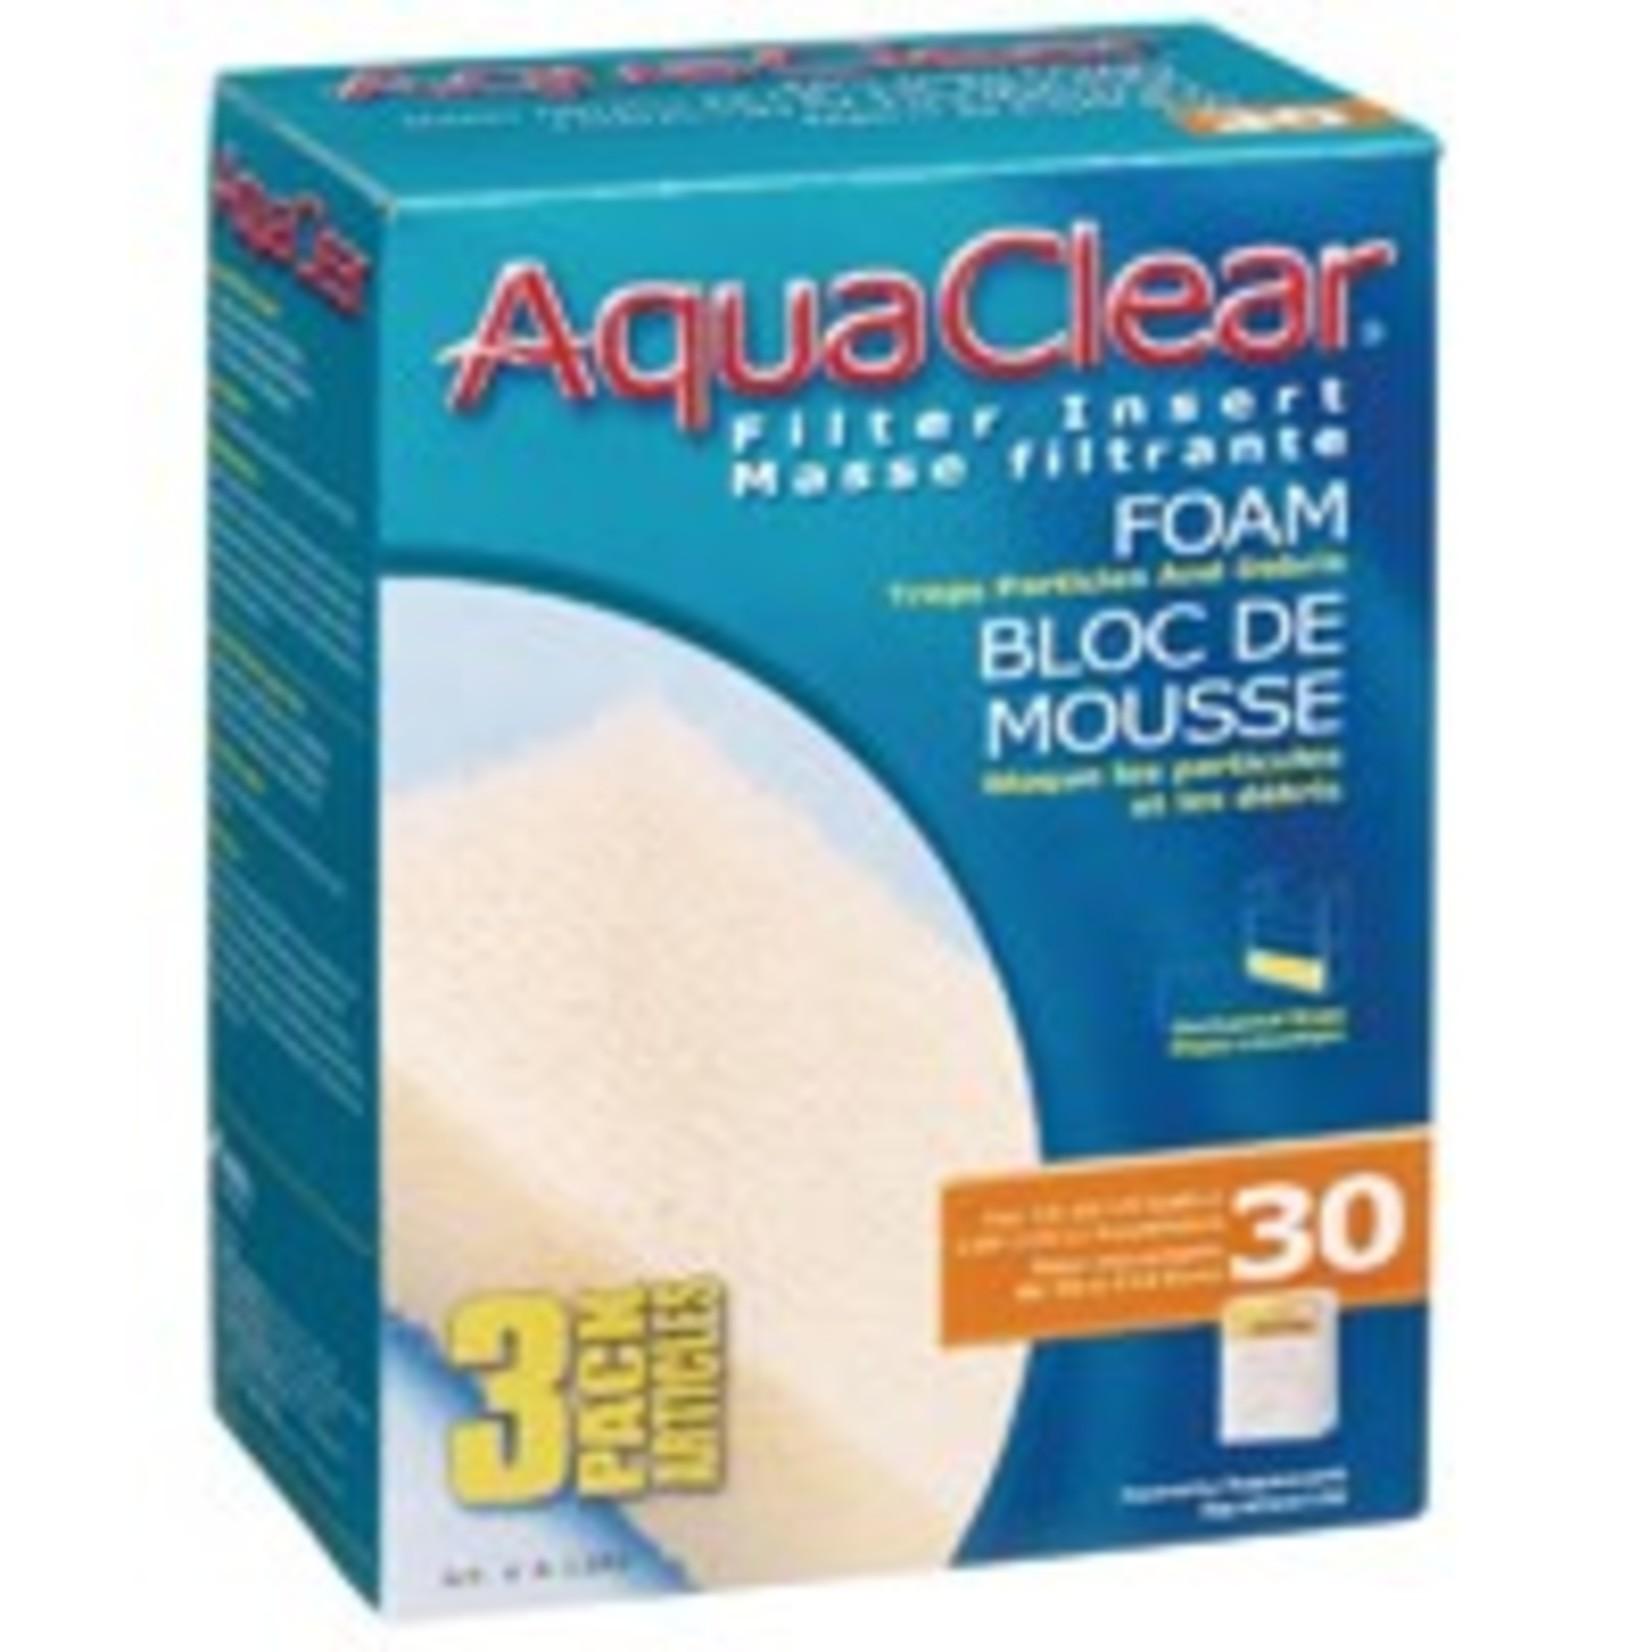 AquaClear 30 Foam Insert (3/pack)